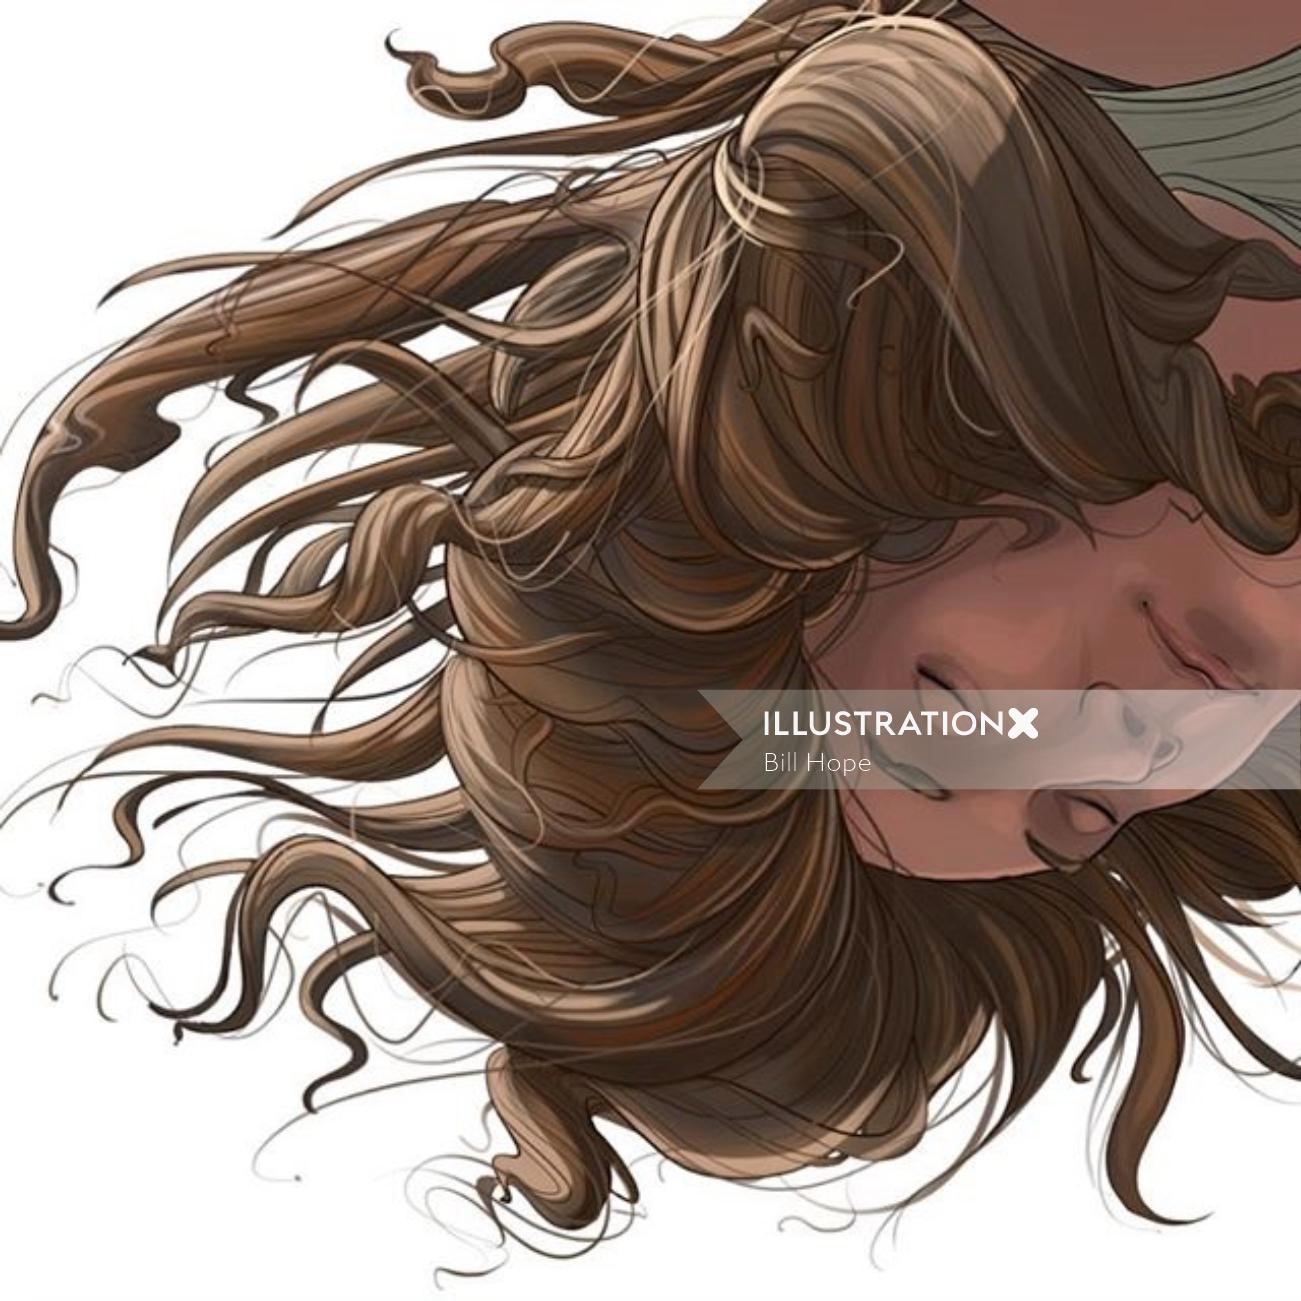 Woman upside down digital art